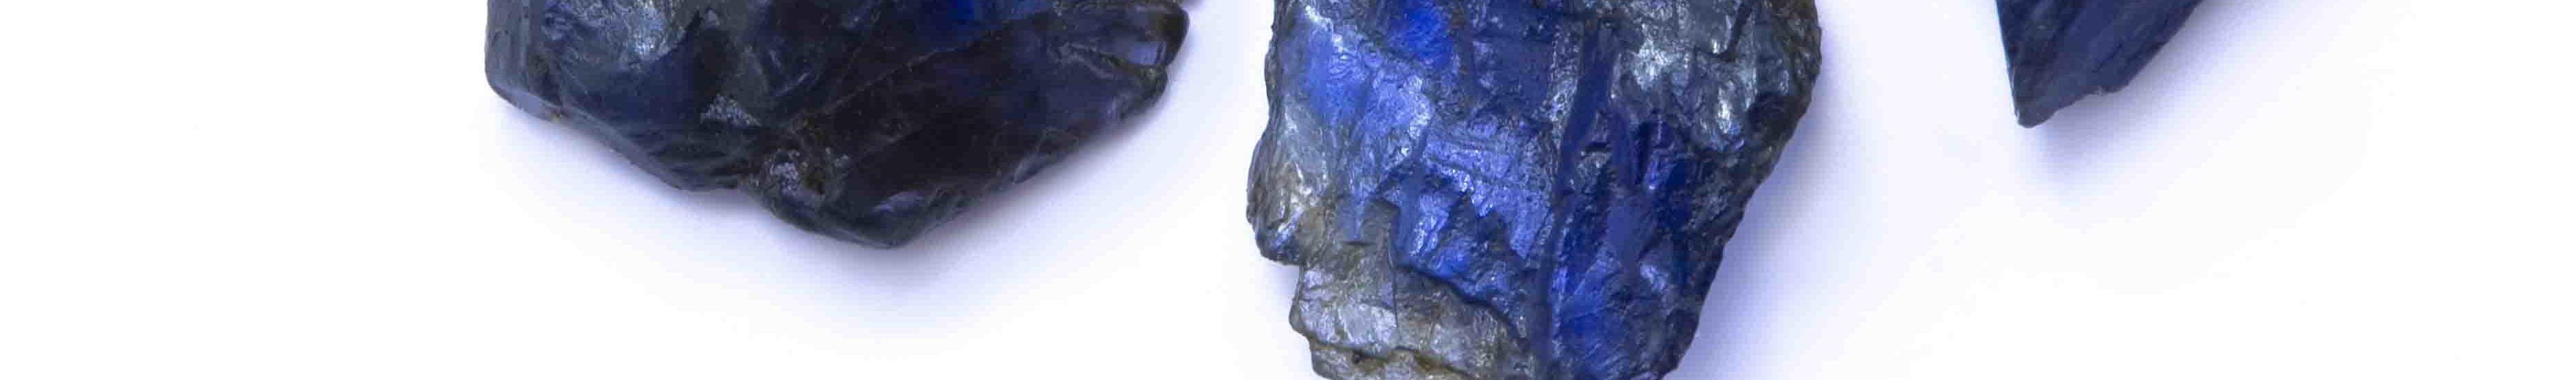 rough sapphire closeup